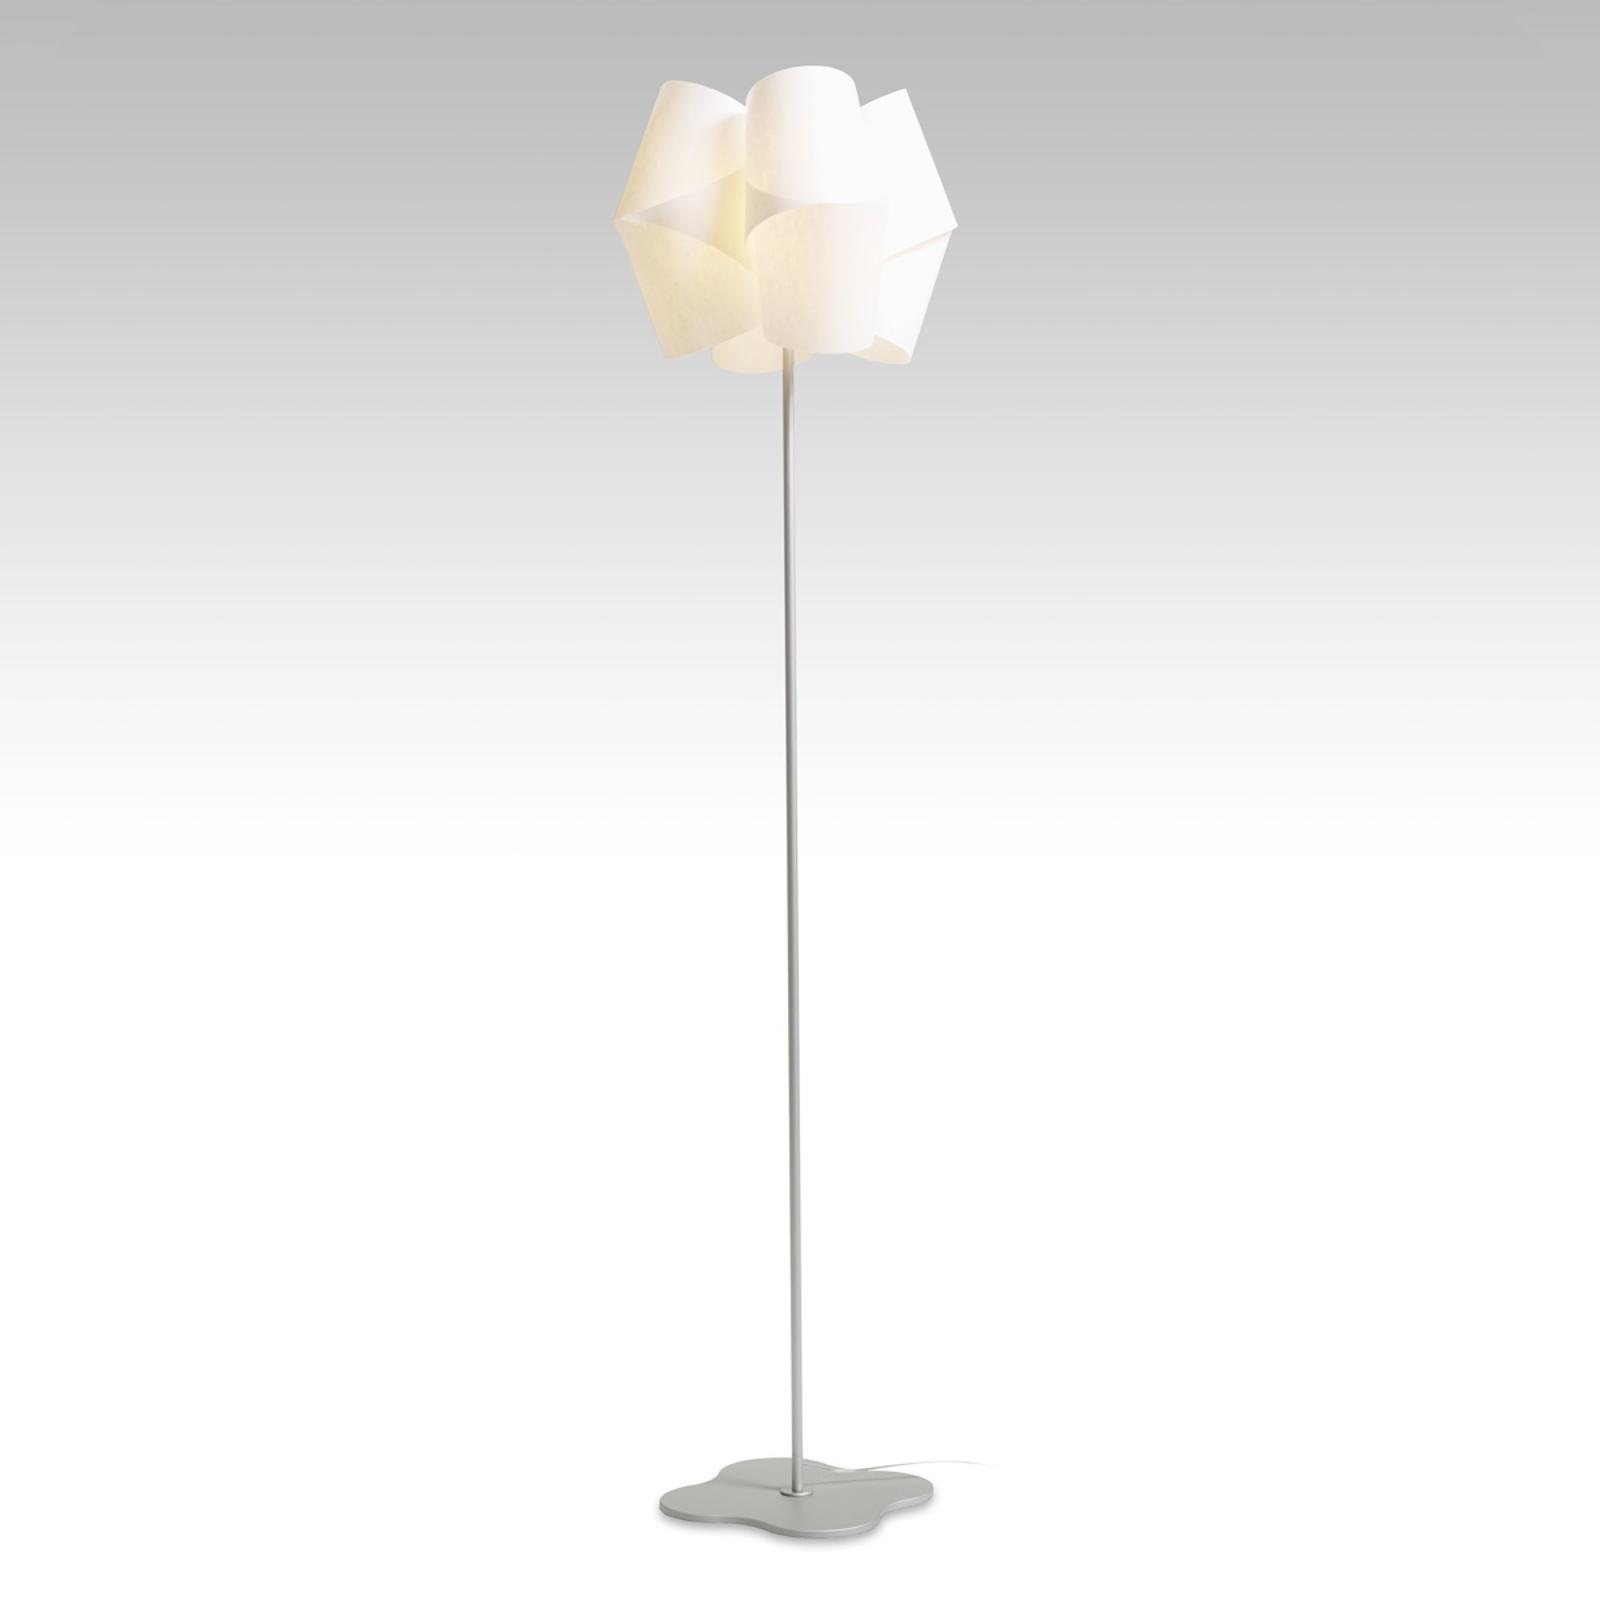 Aluminiumsfod - standerlampe Julii